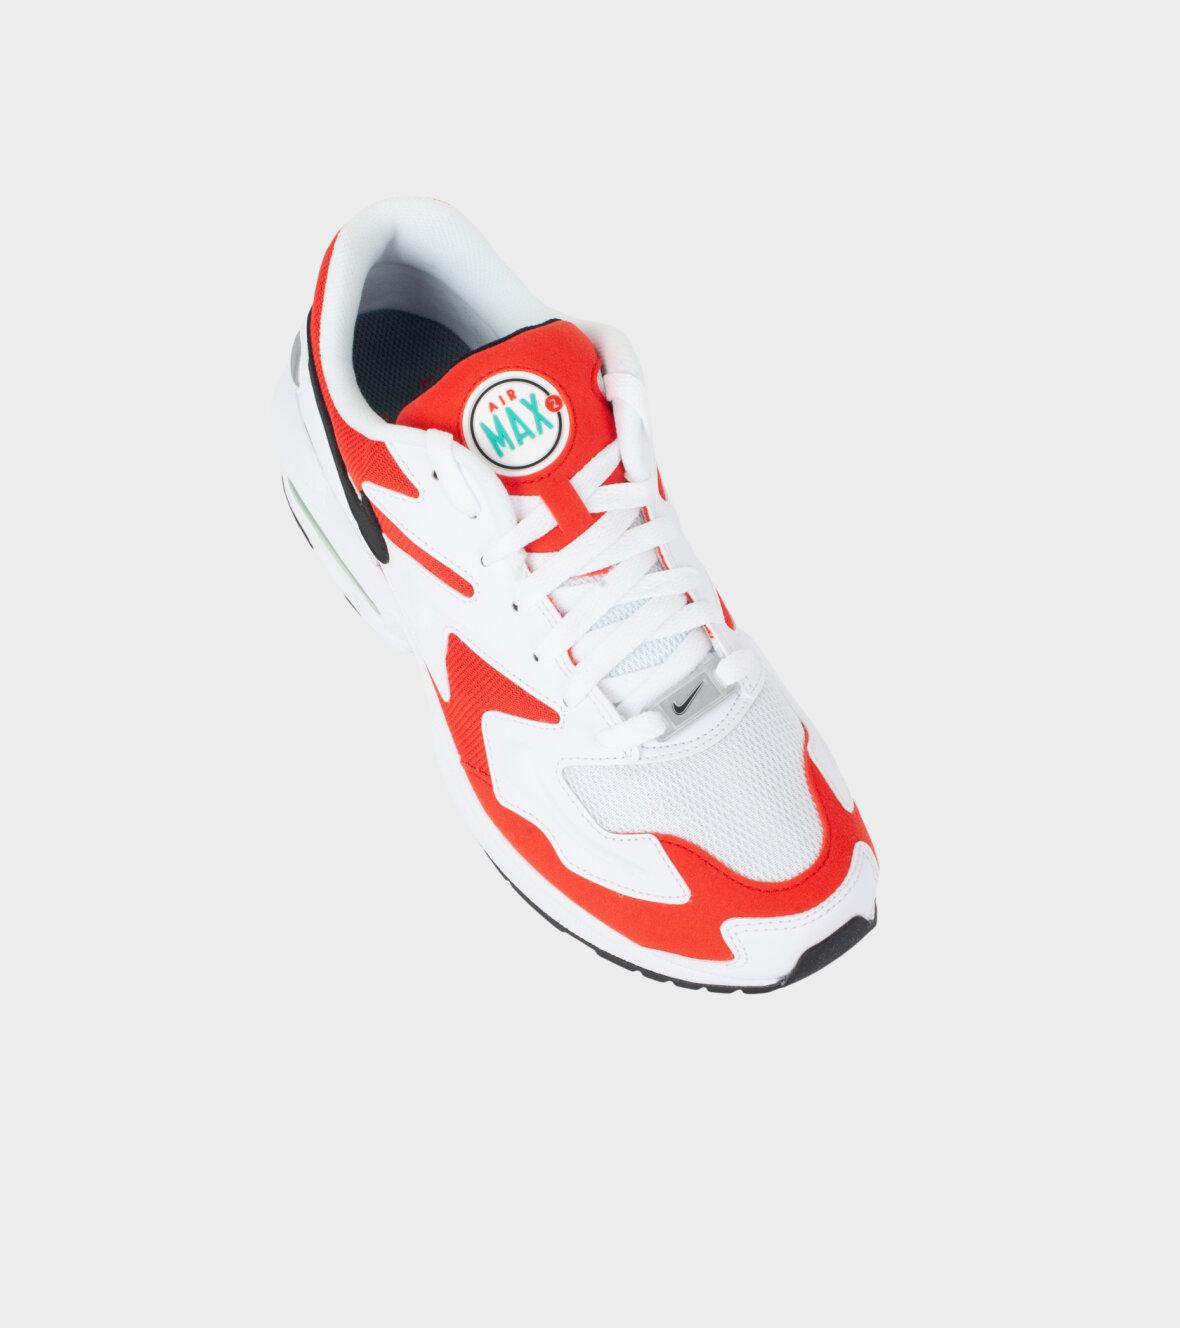 Nike Air Max2 Light AO1741 dr. Adams